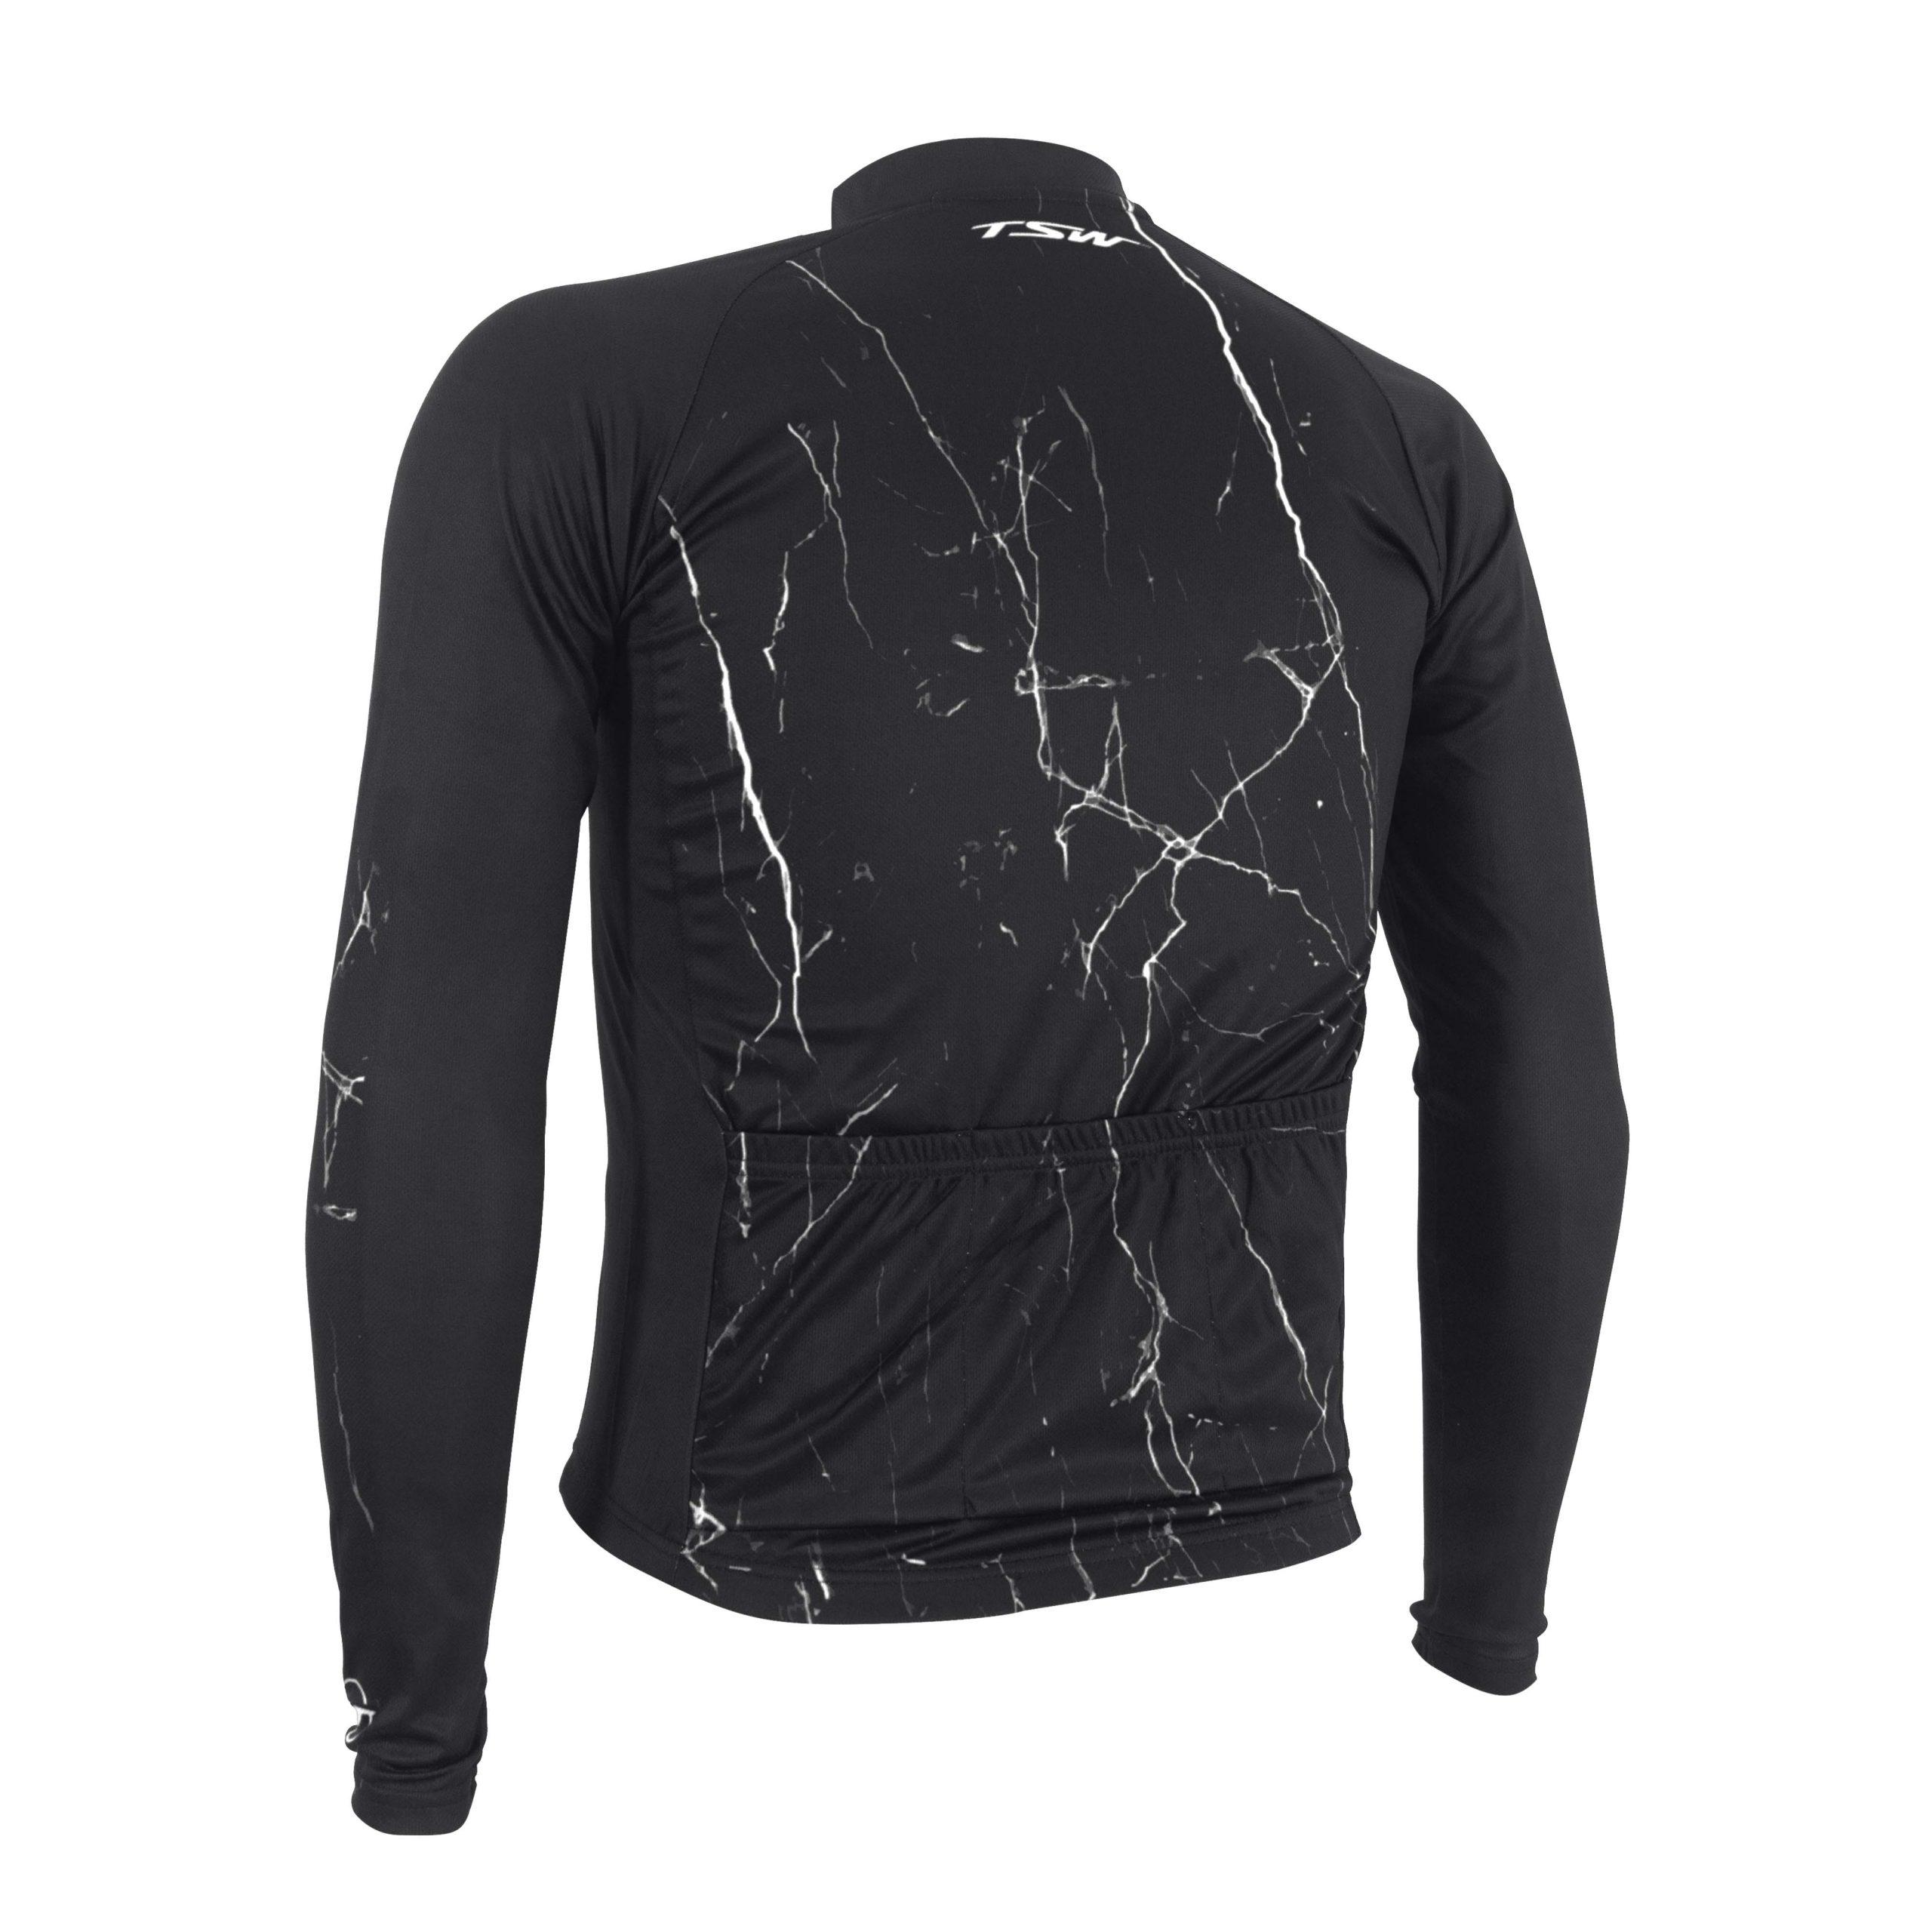 Camisa manga longa para ciclismo STORM | PRO LINE 5